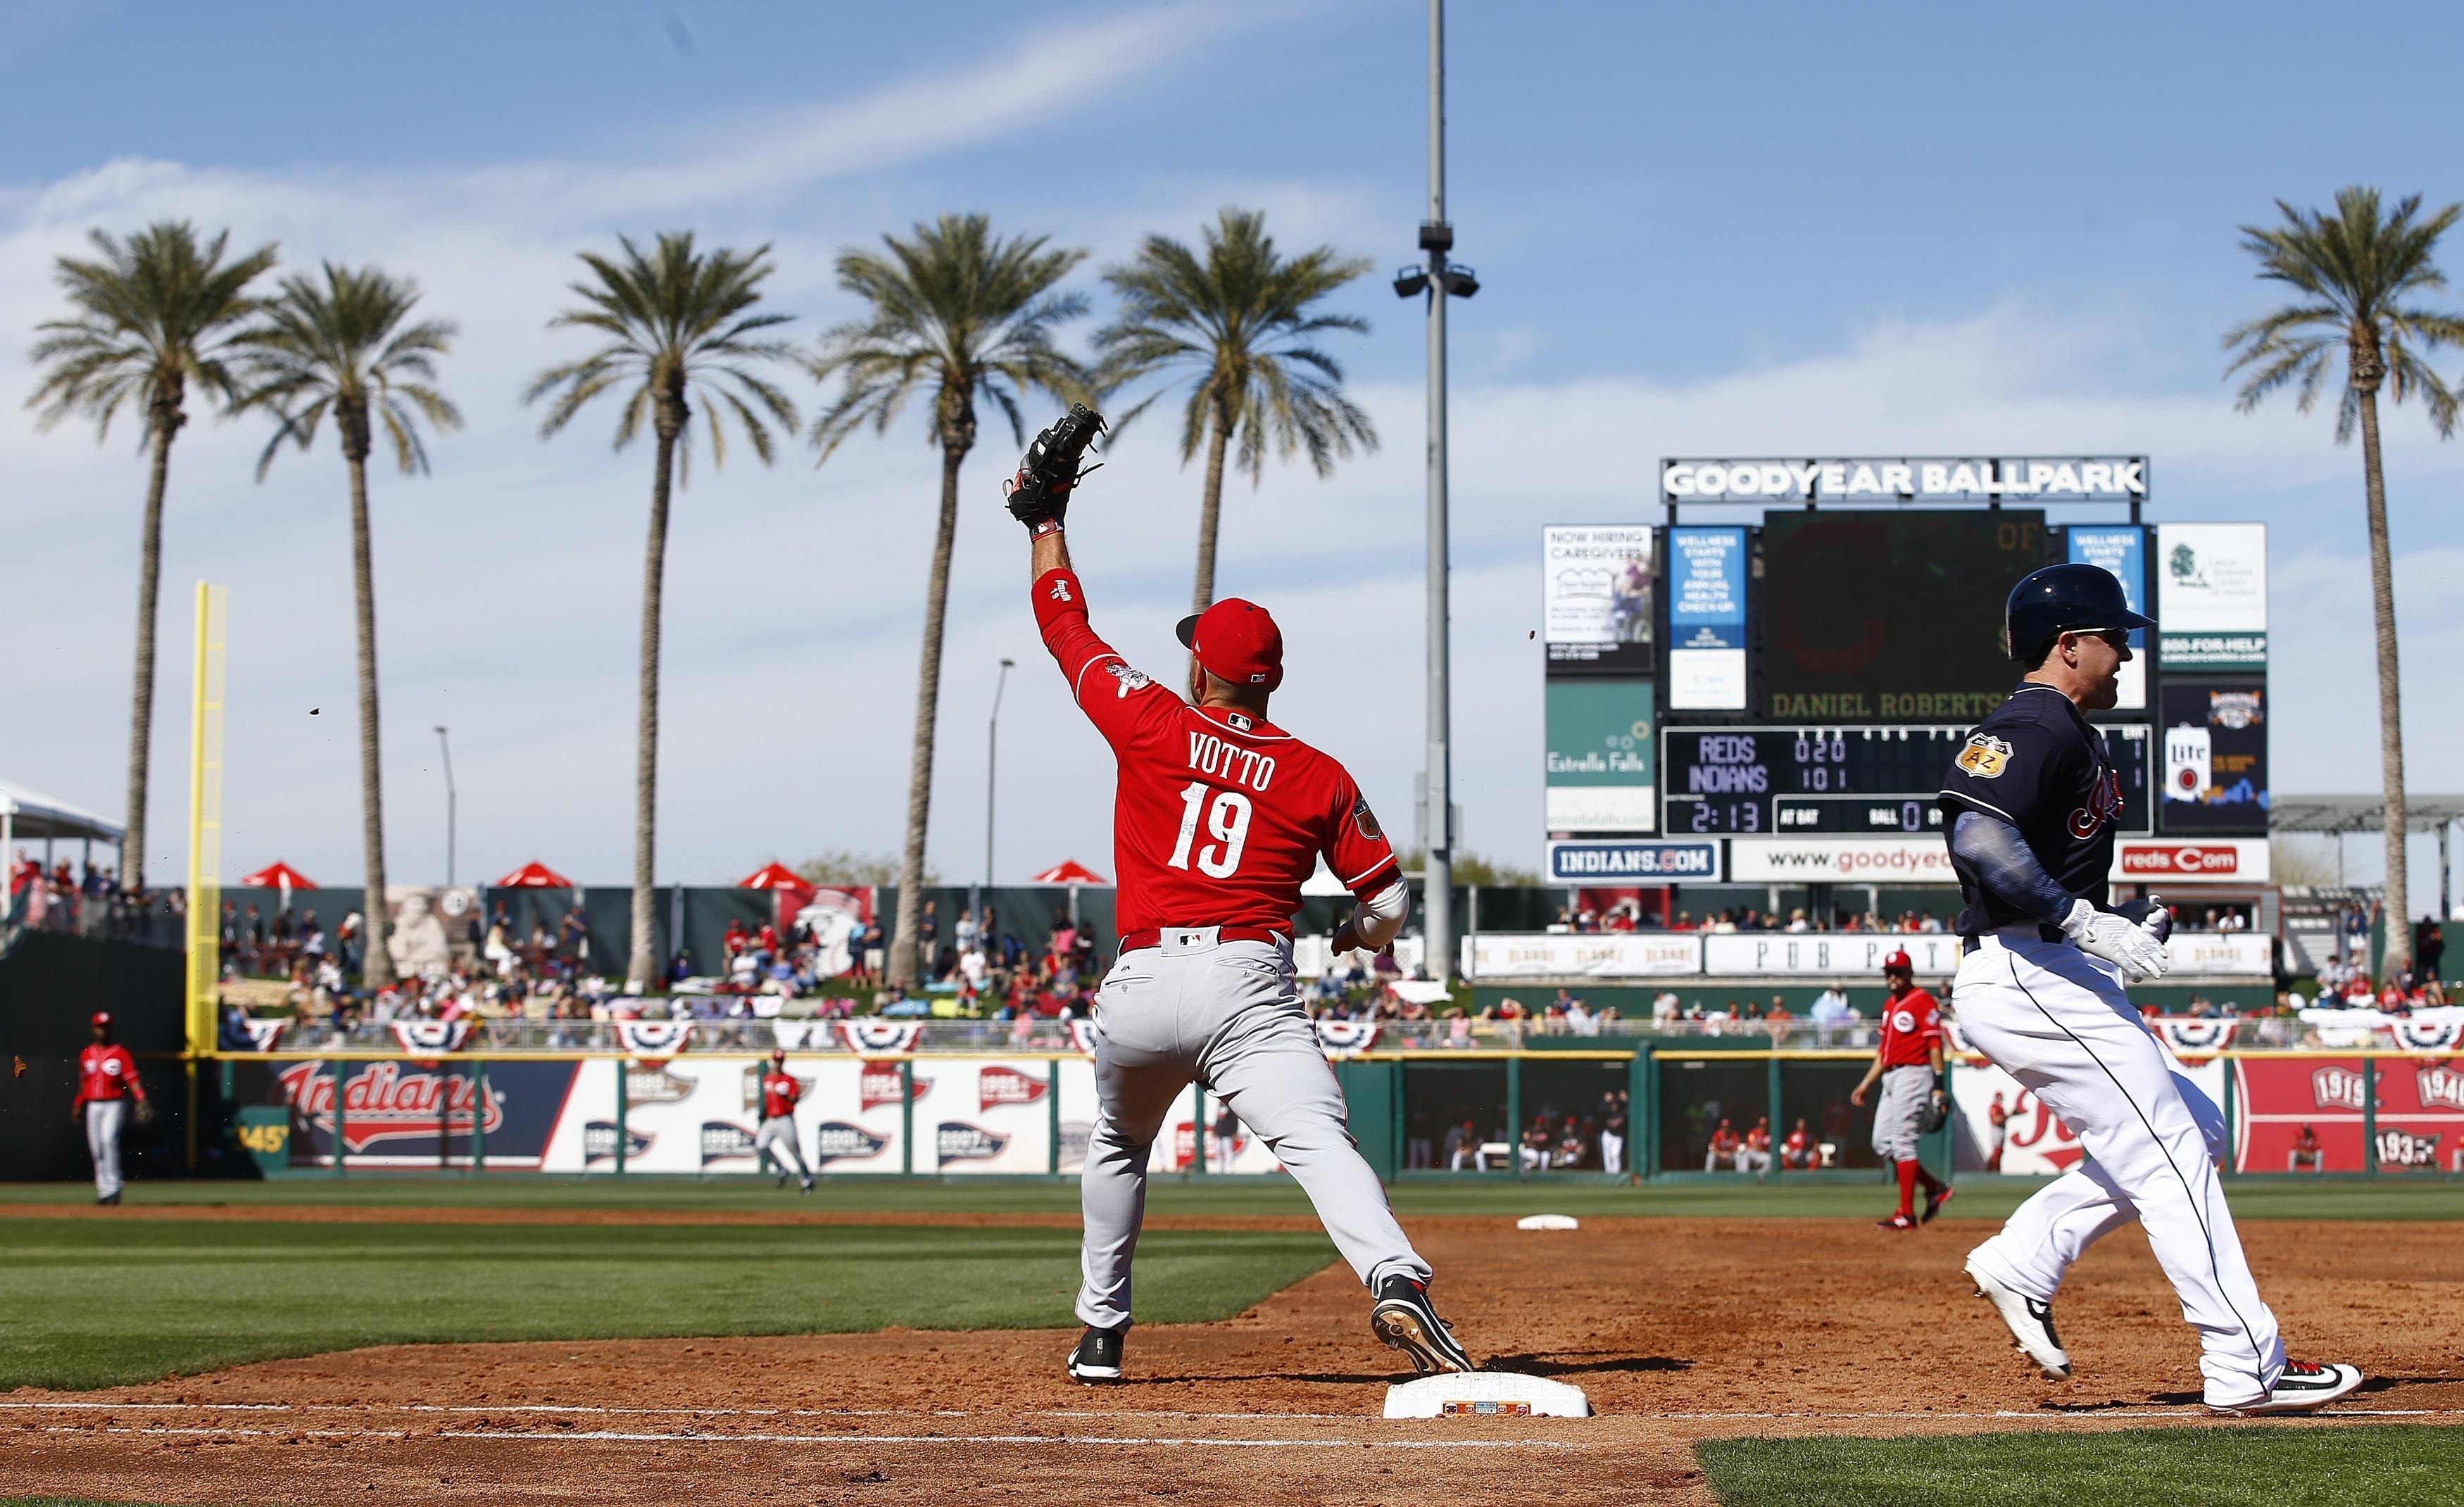 Reds_indians_spring_baseball_77573